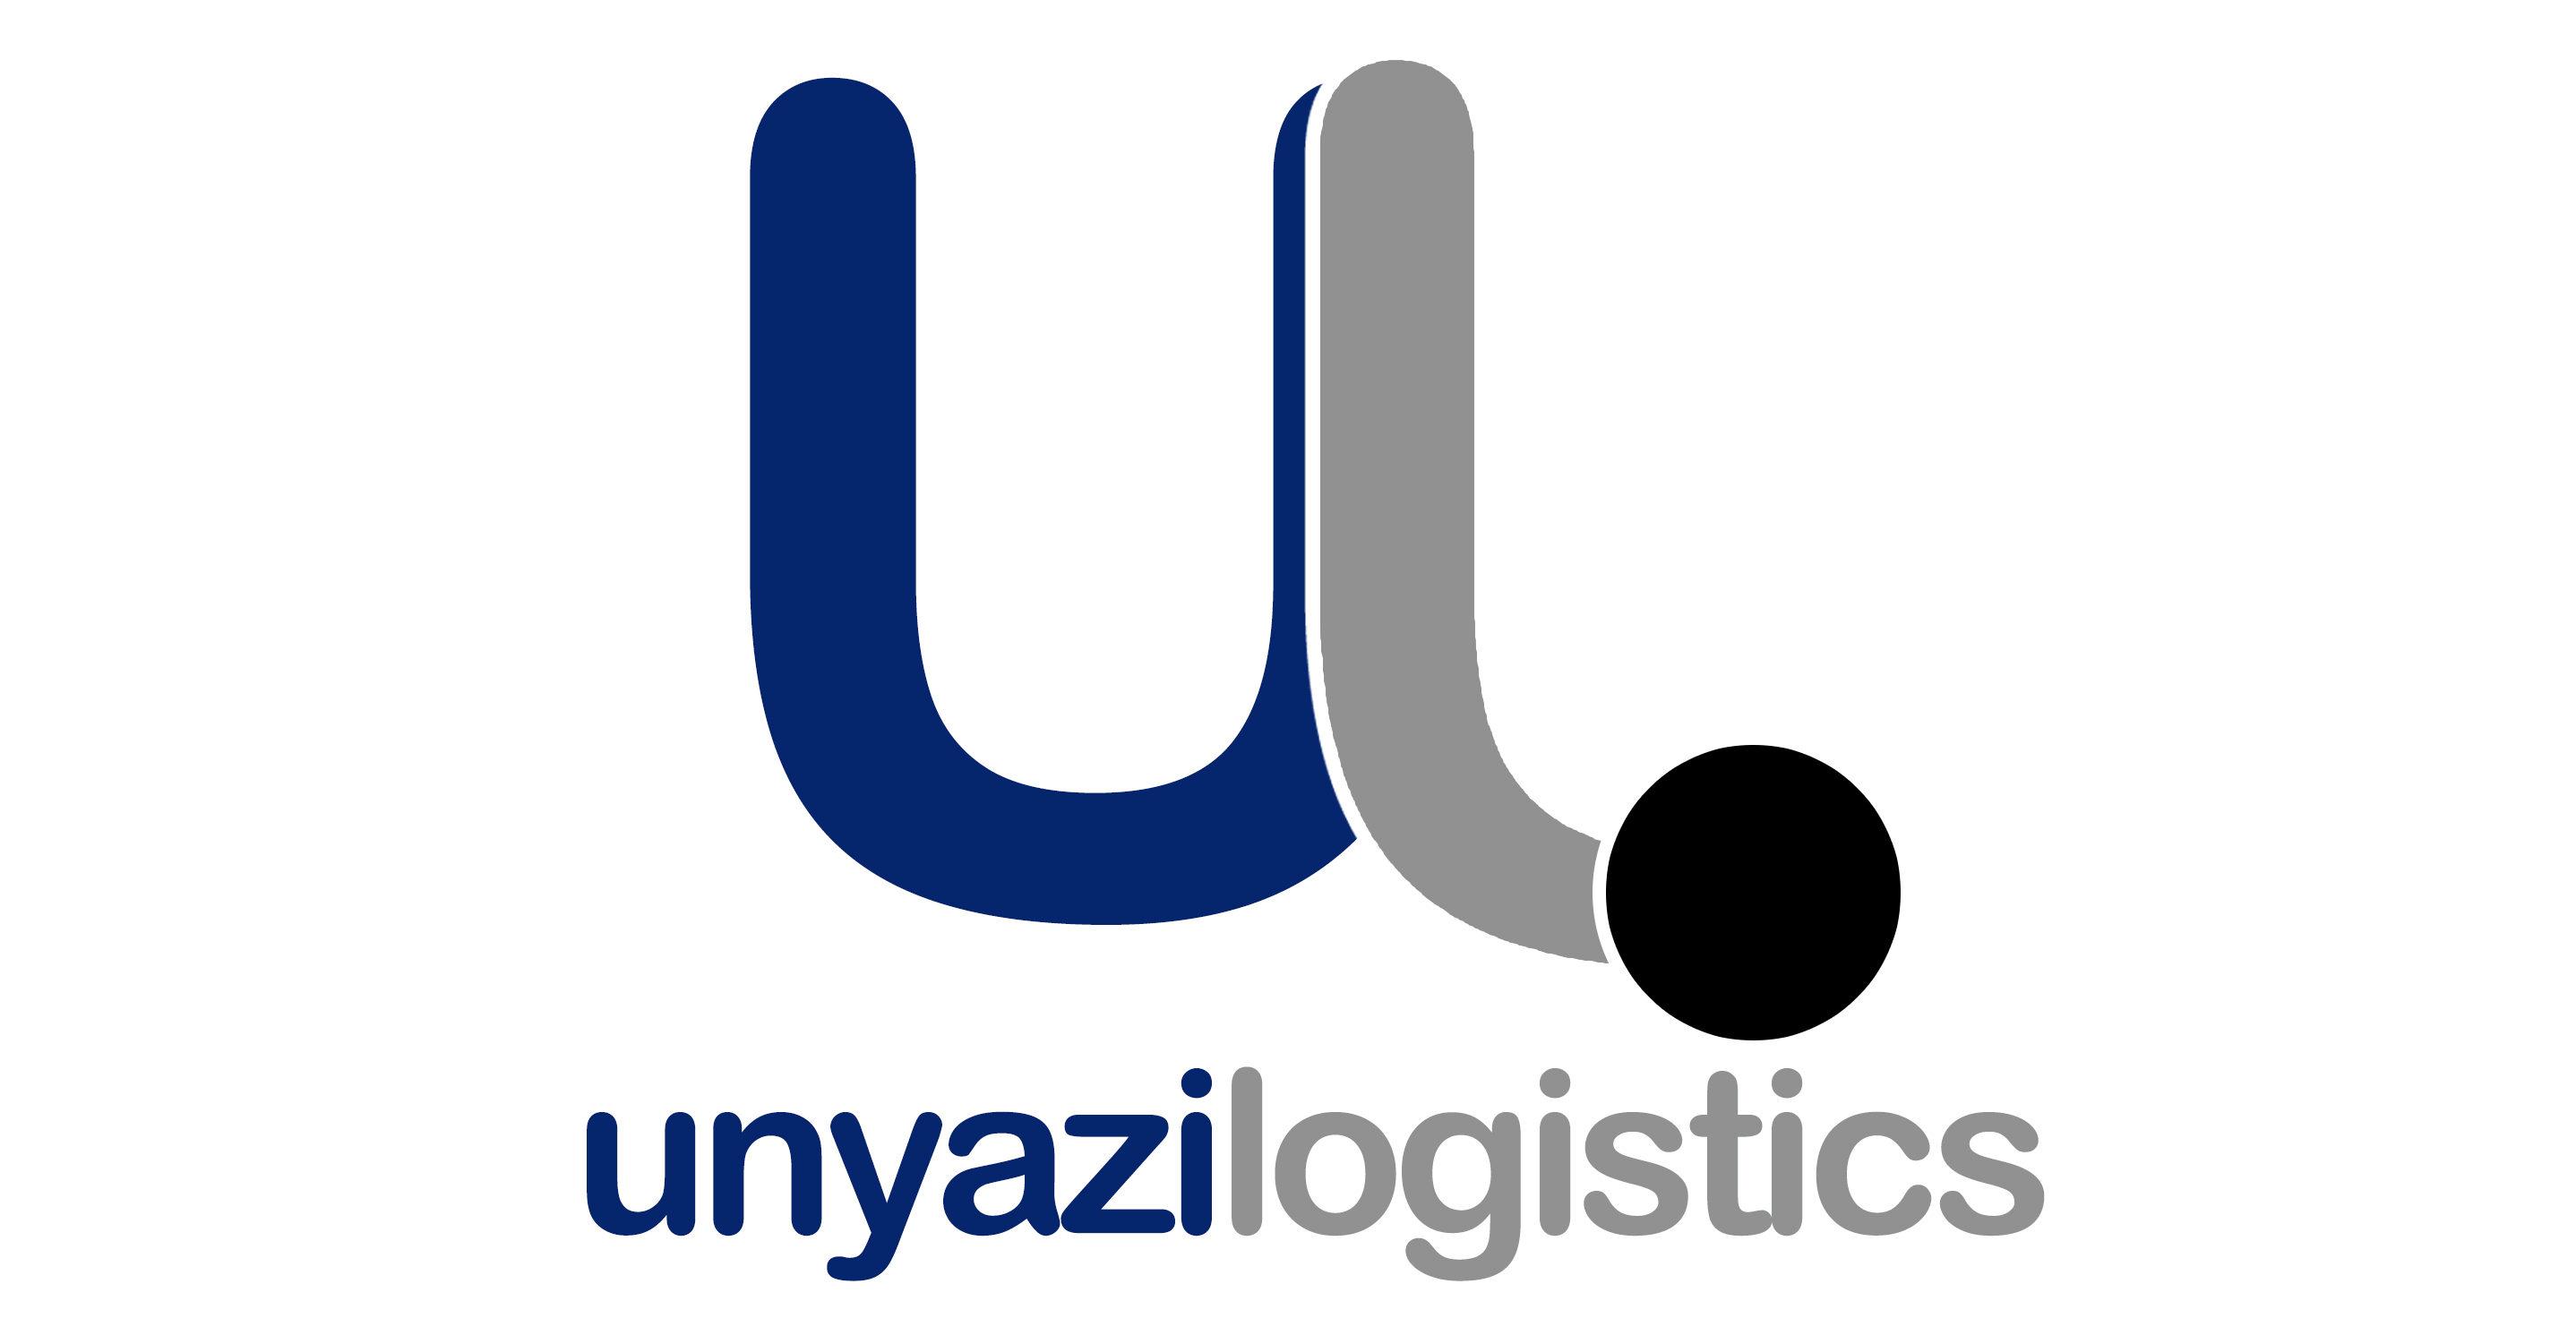 Unyazi Logistics